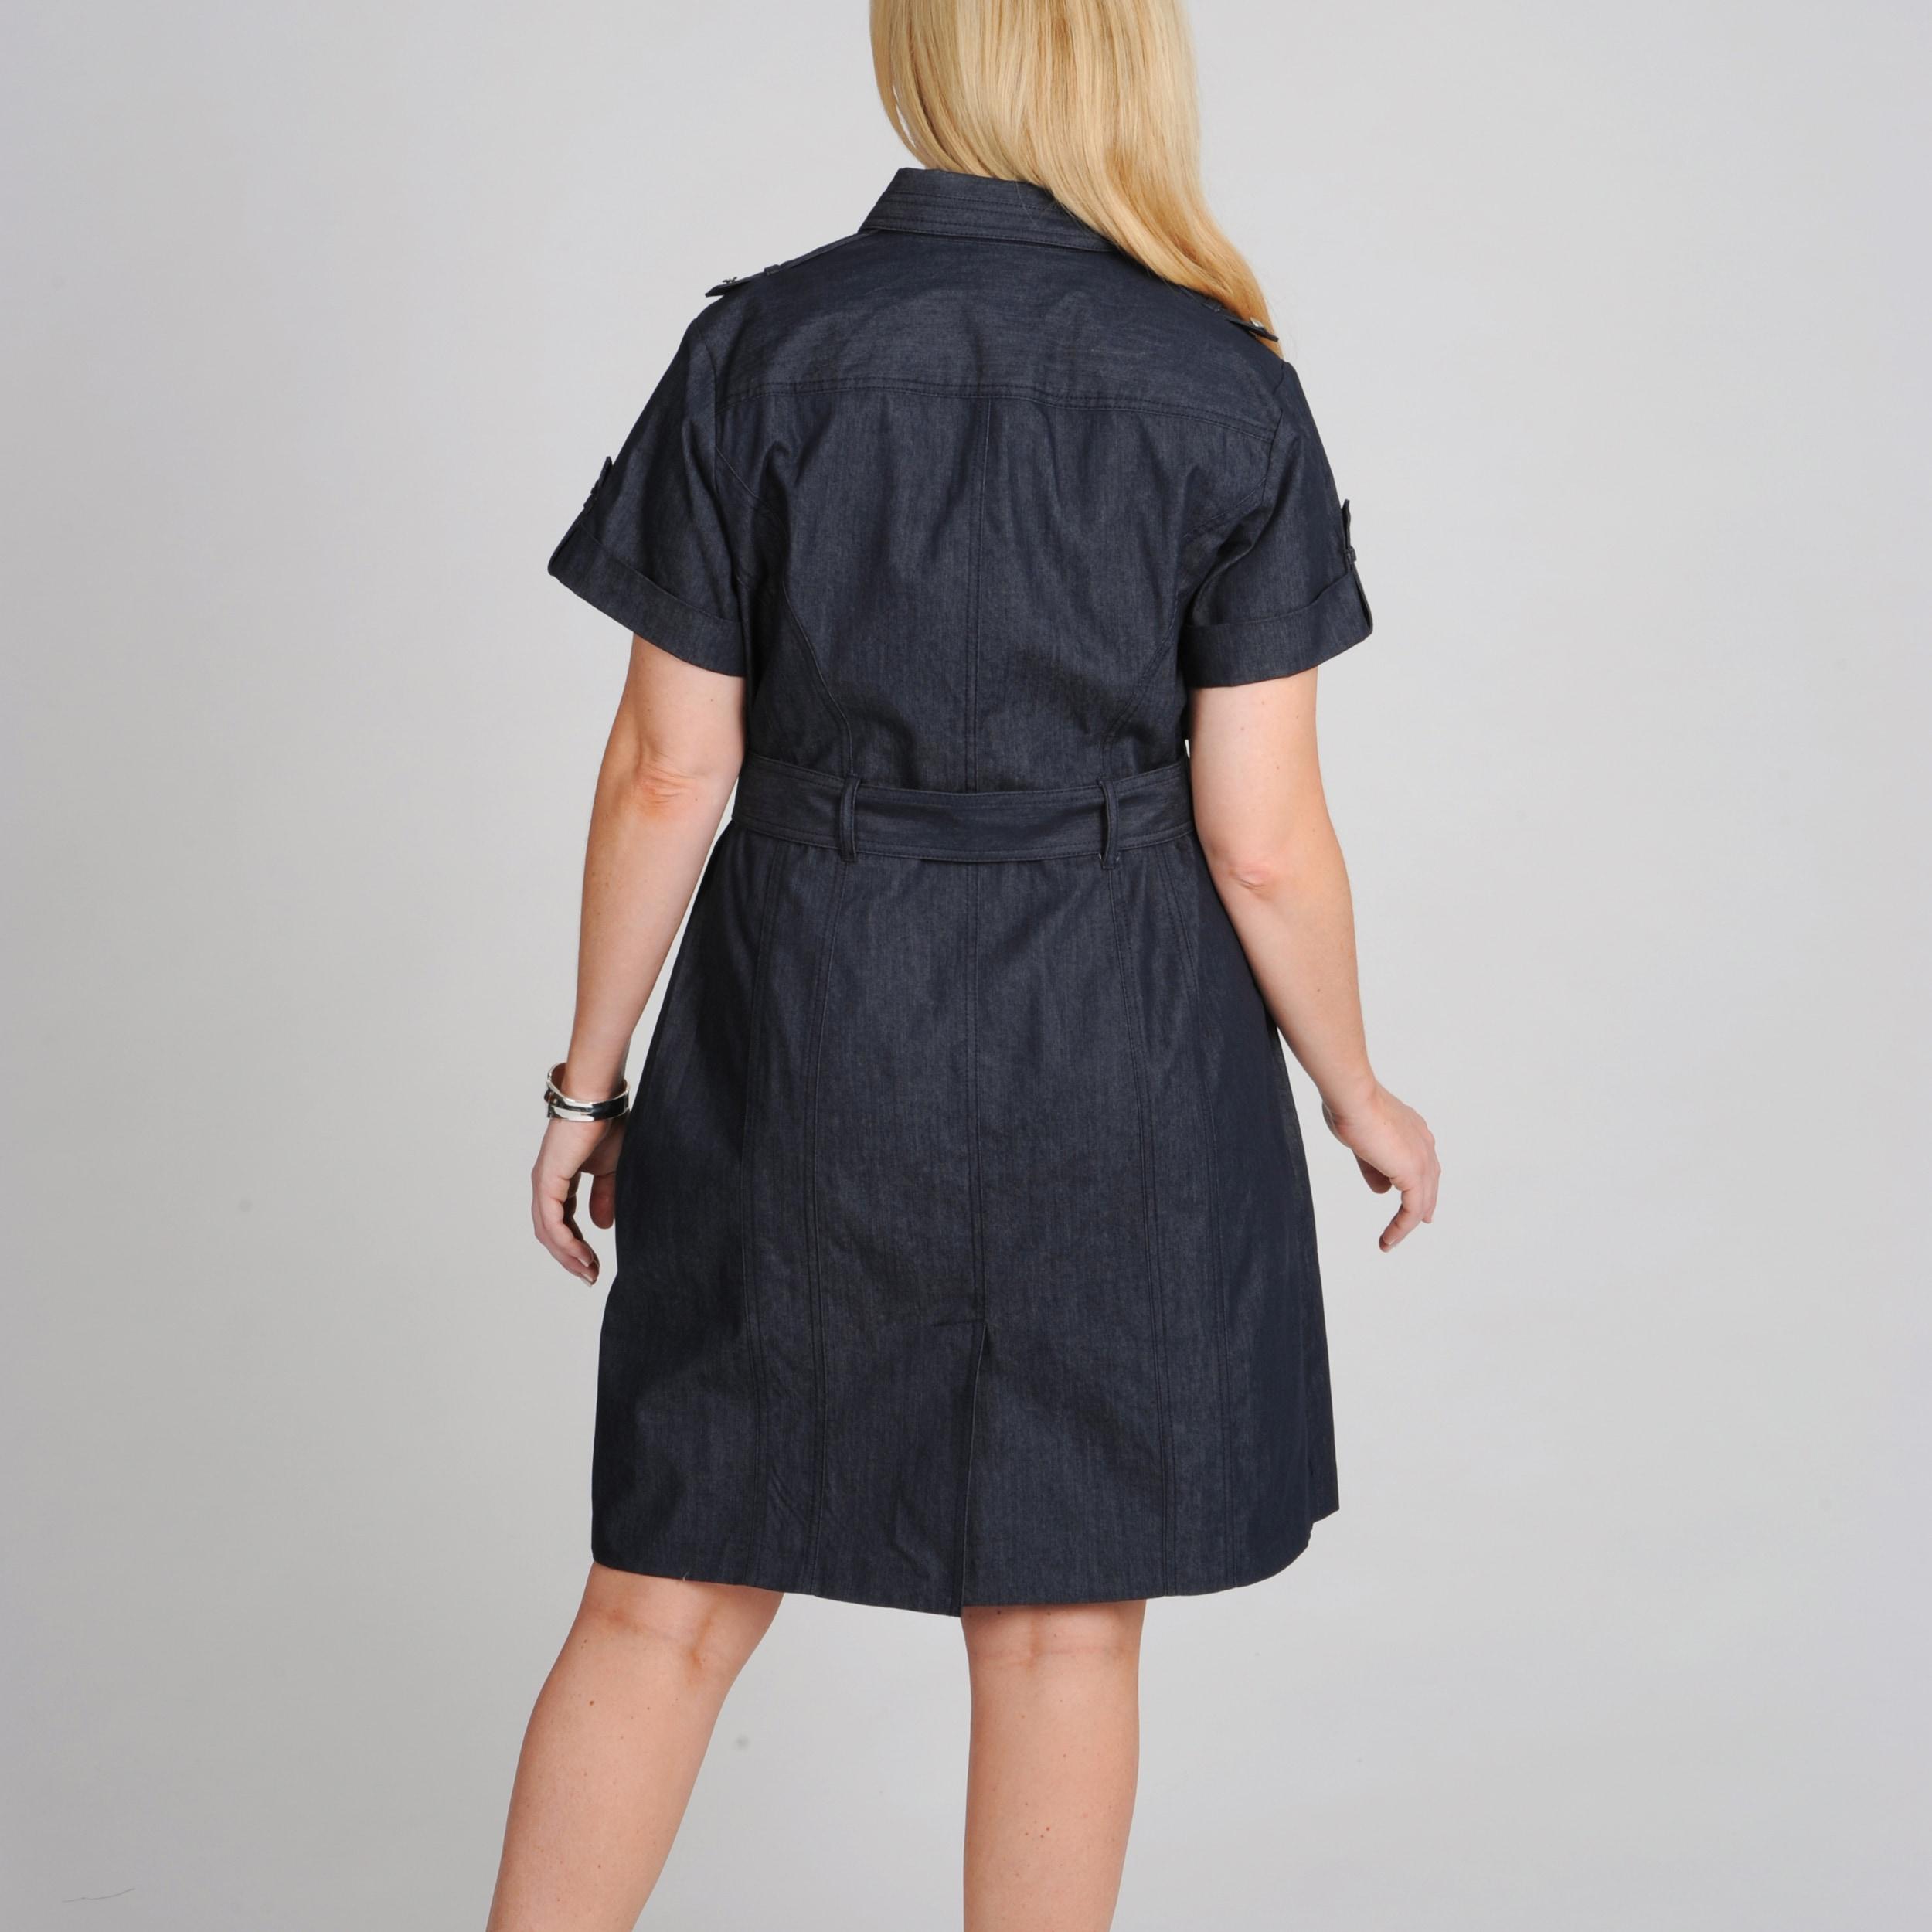 Shop Sharagano Womens Plus Size Belted Shirtdress Free Shipping